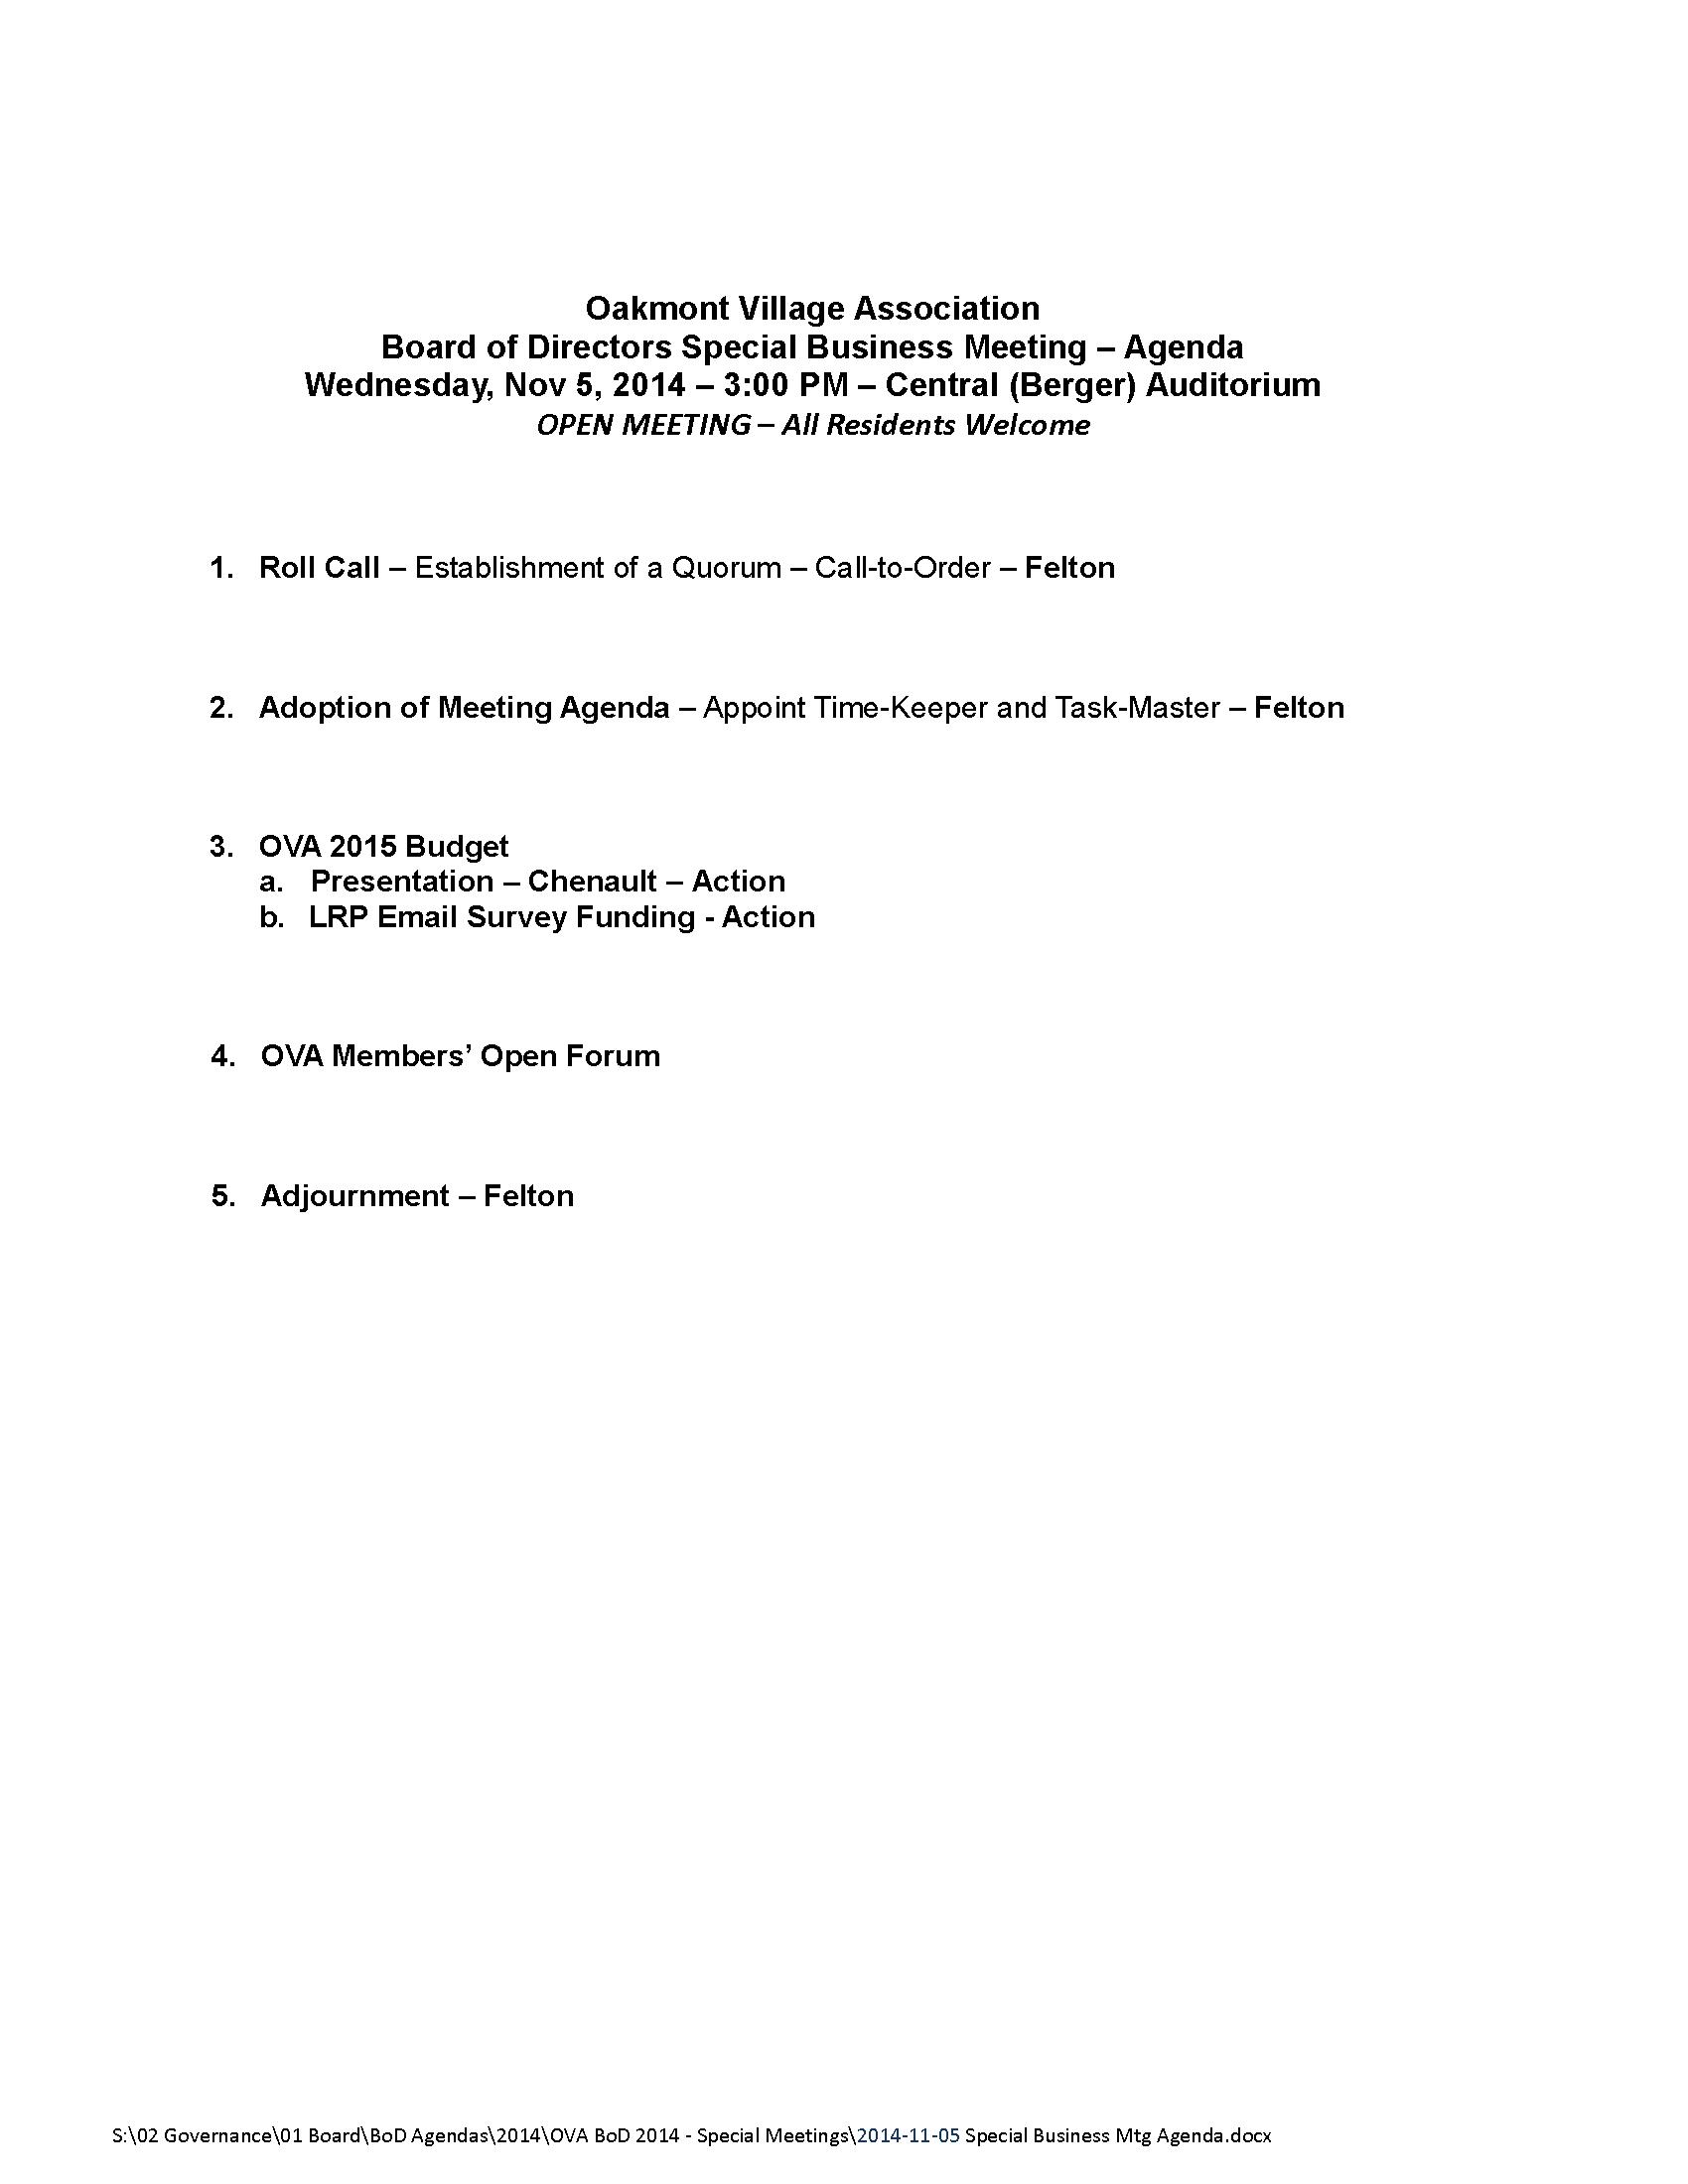 2014-11-05 Special Business Mtg Agenda